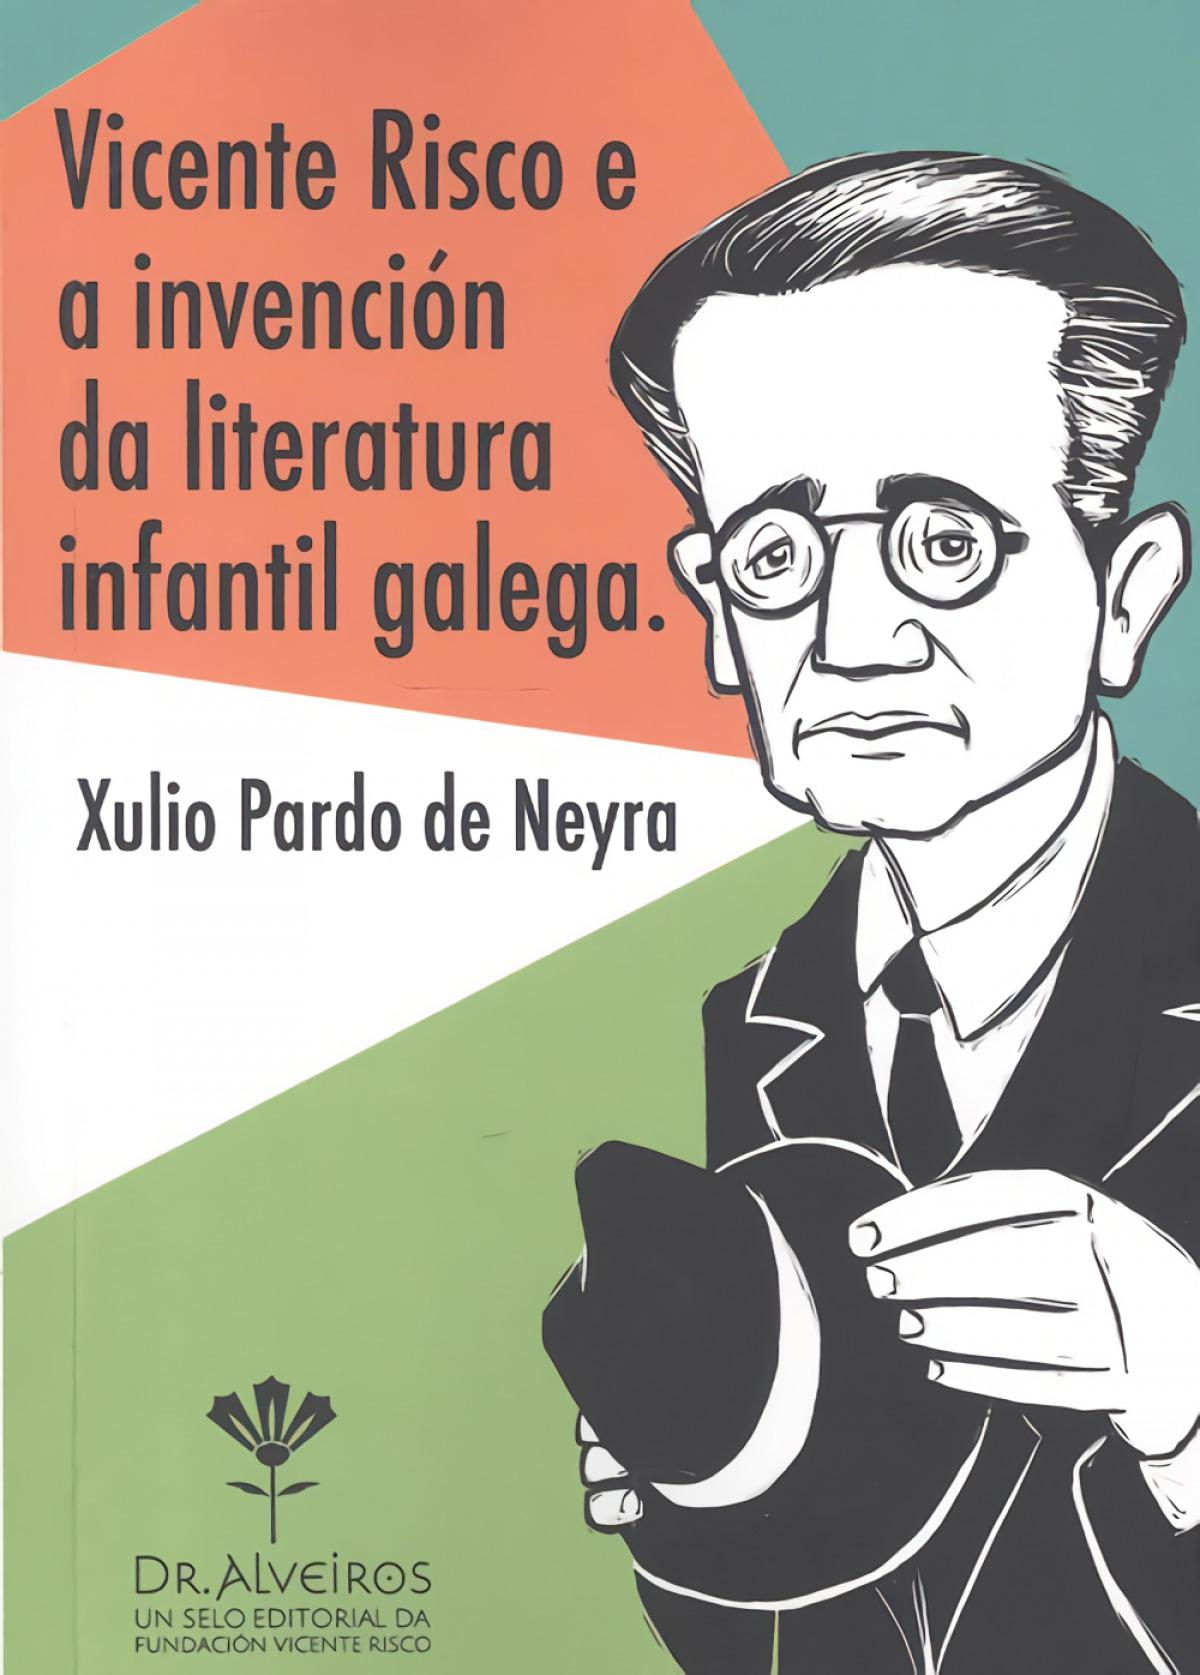 (g).vicente risco e a invencion literatura infantil galega